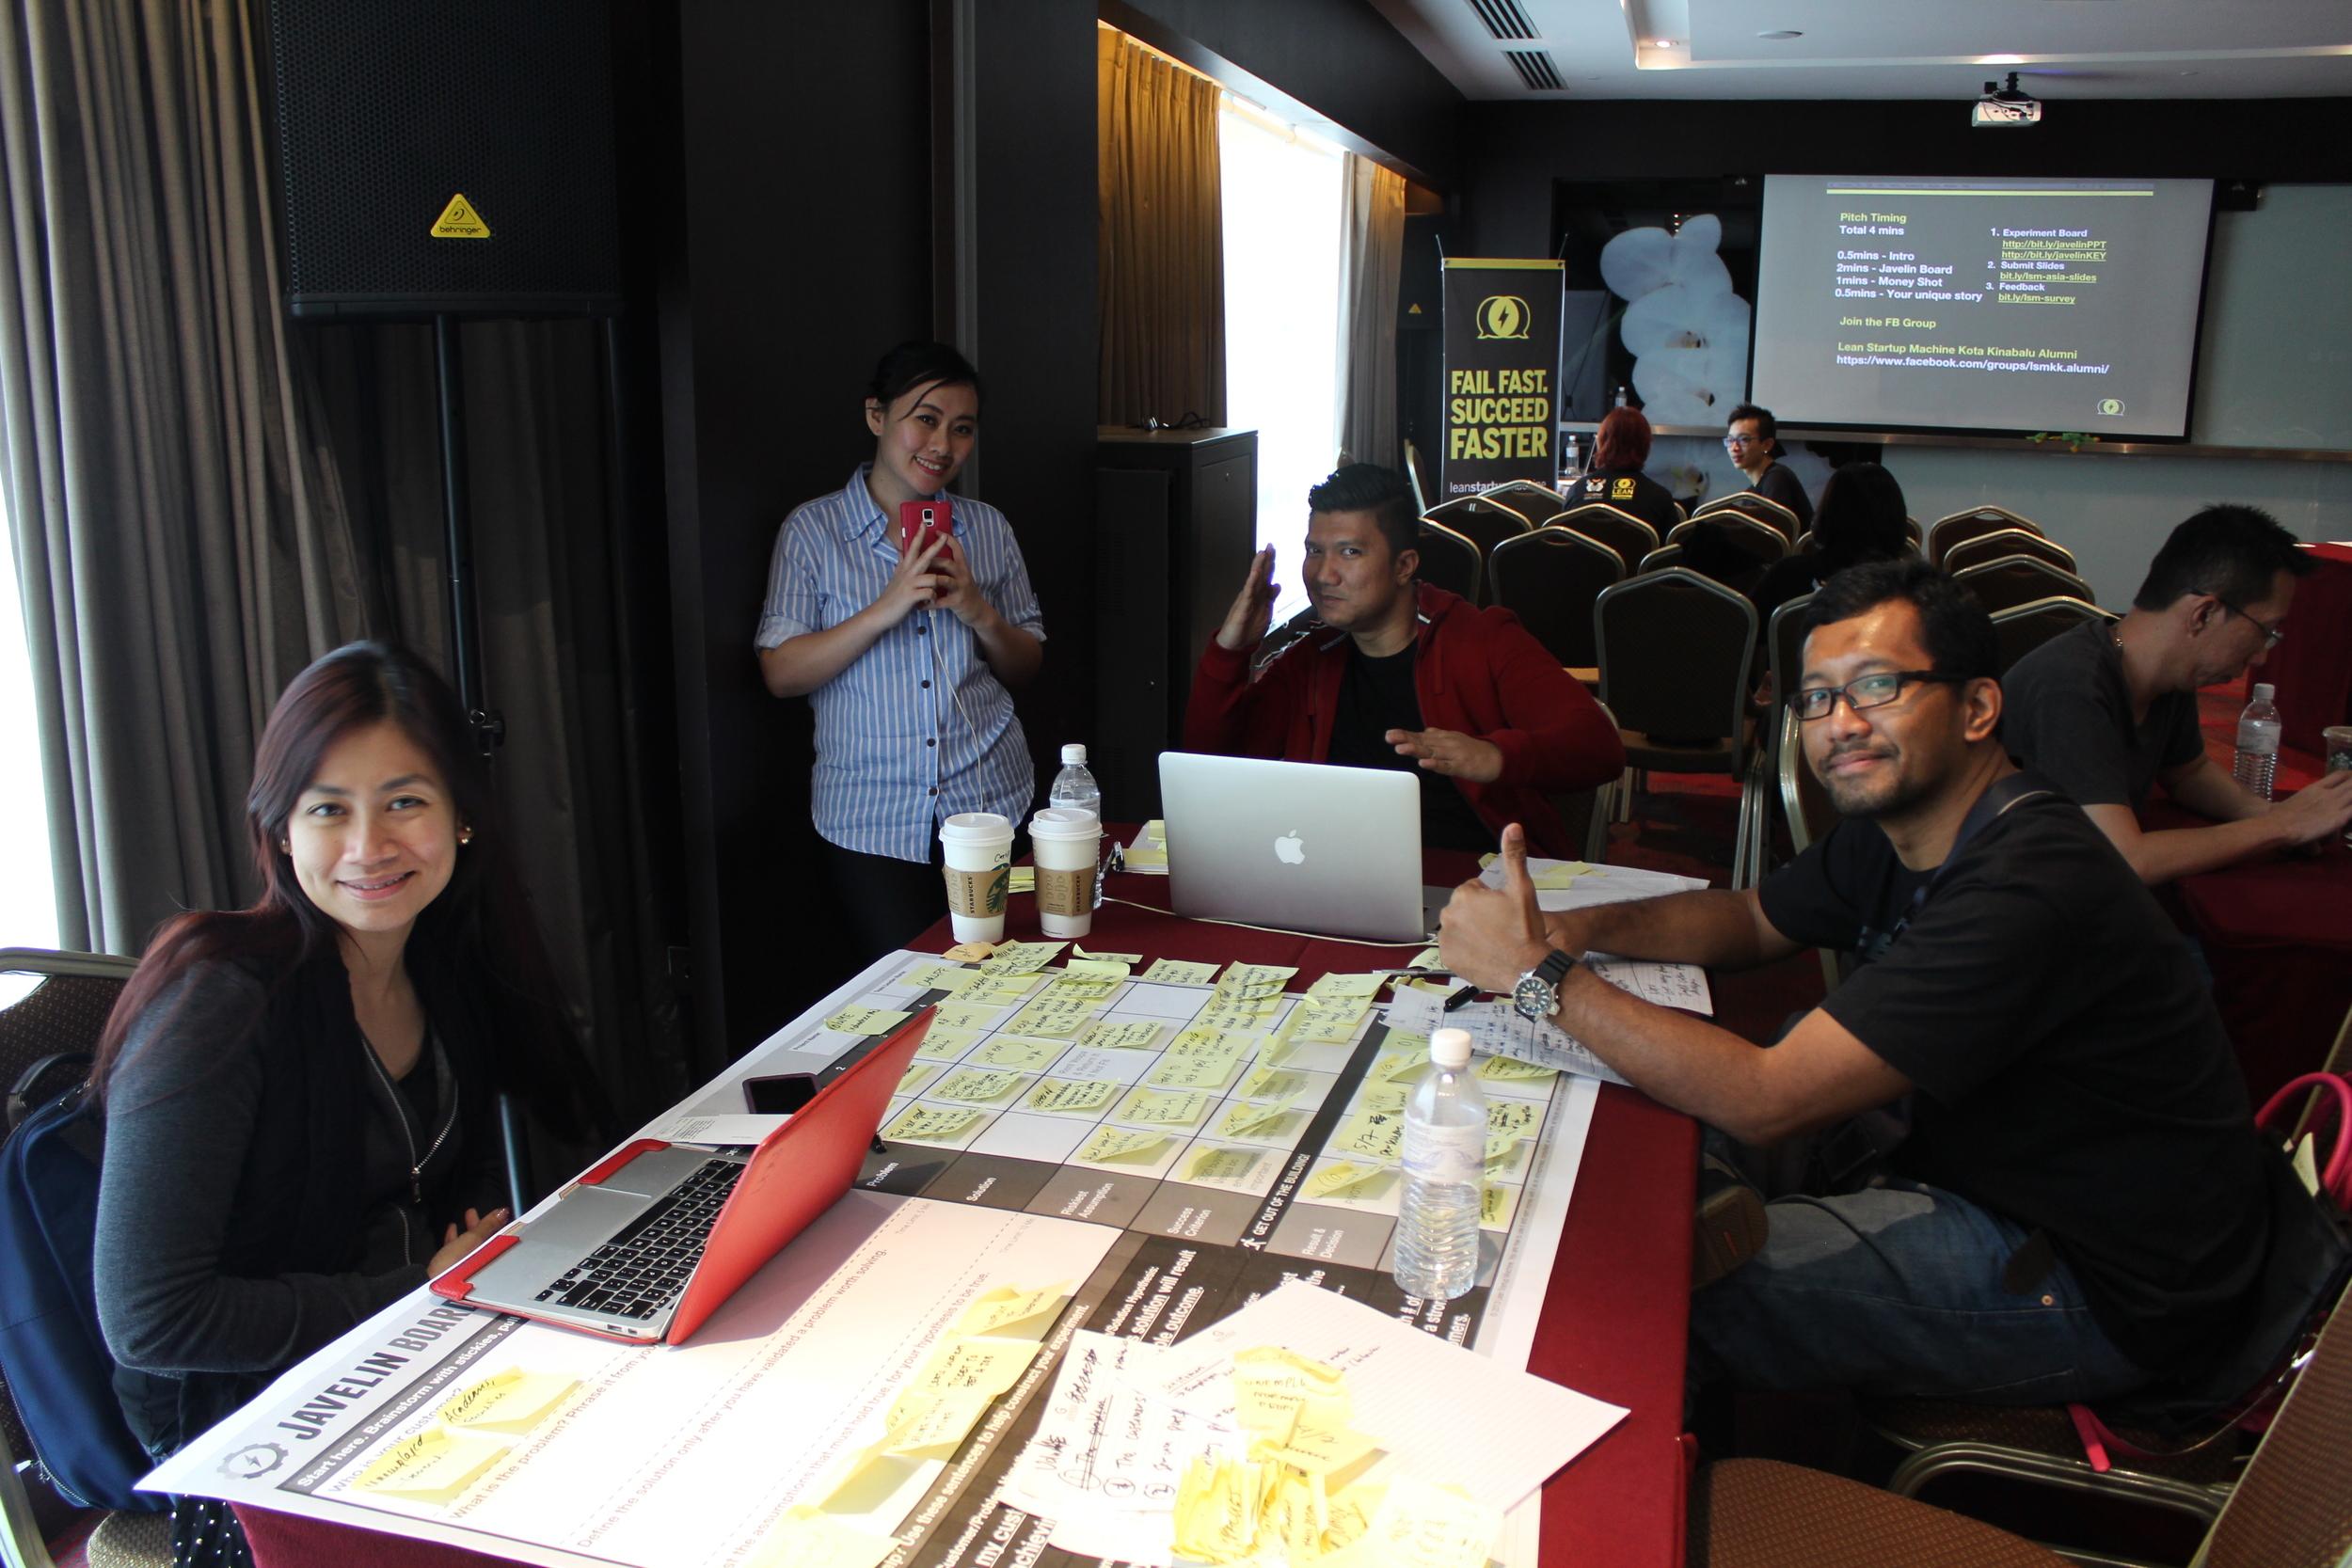 Team VoluME had time to pose while preparing their presentation